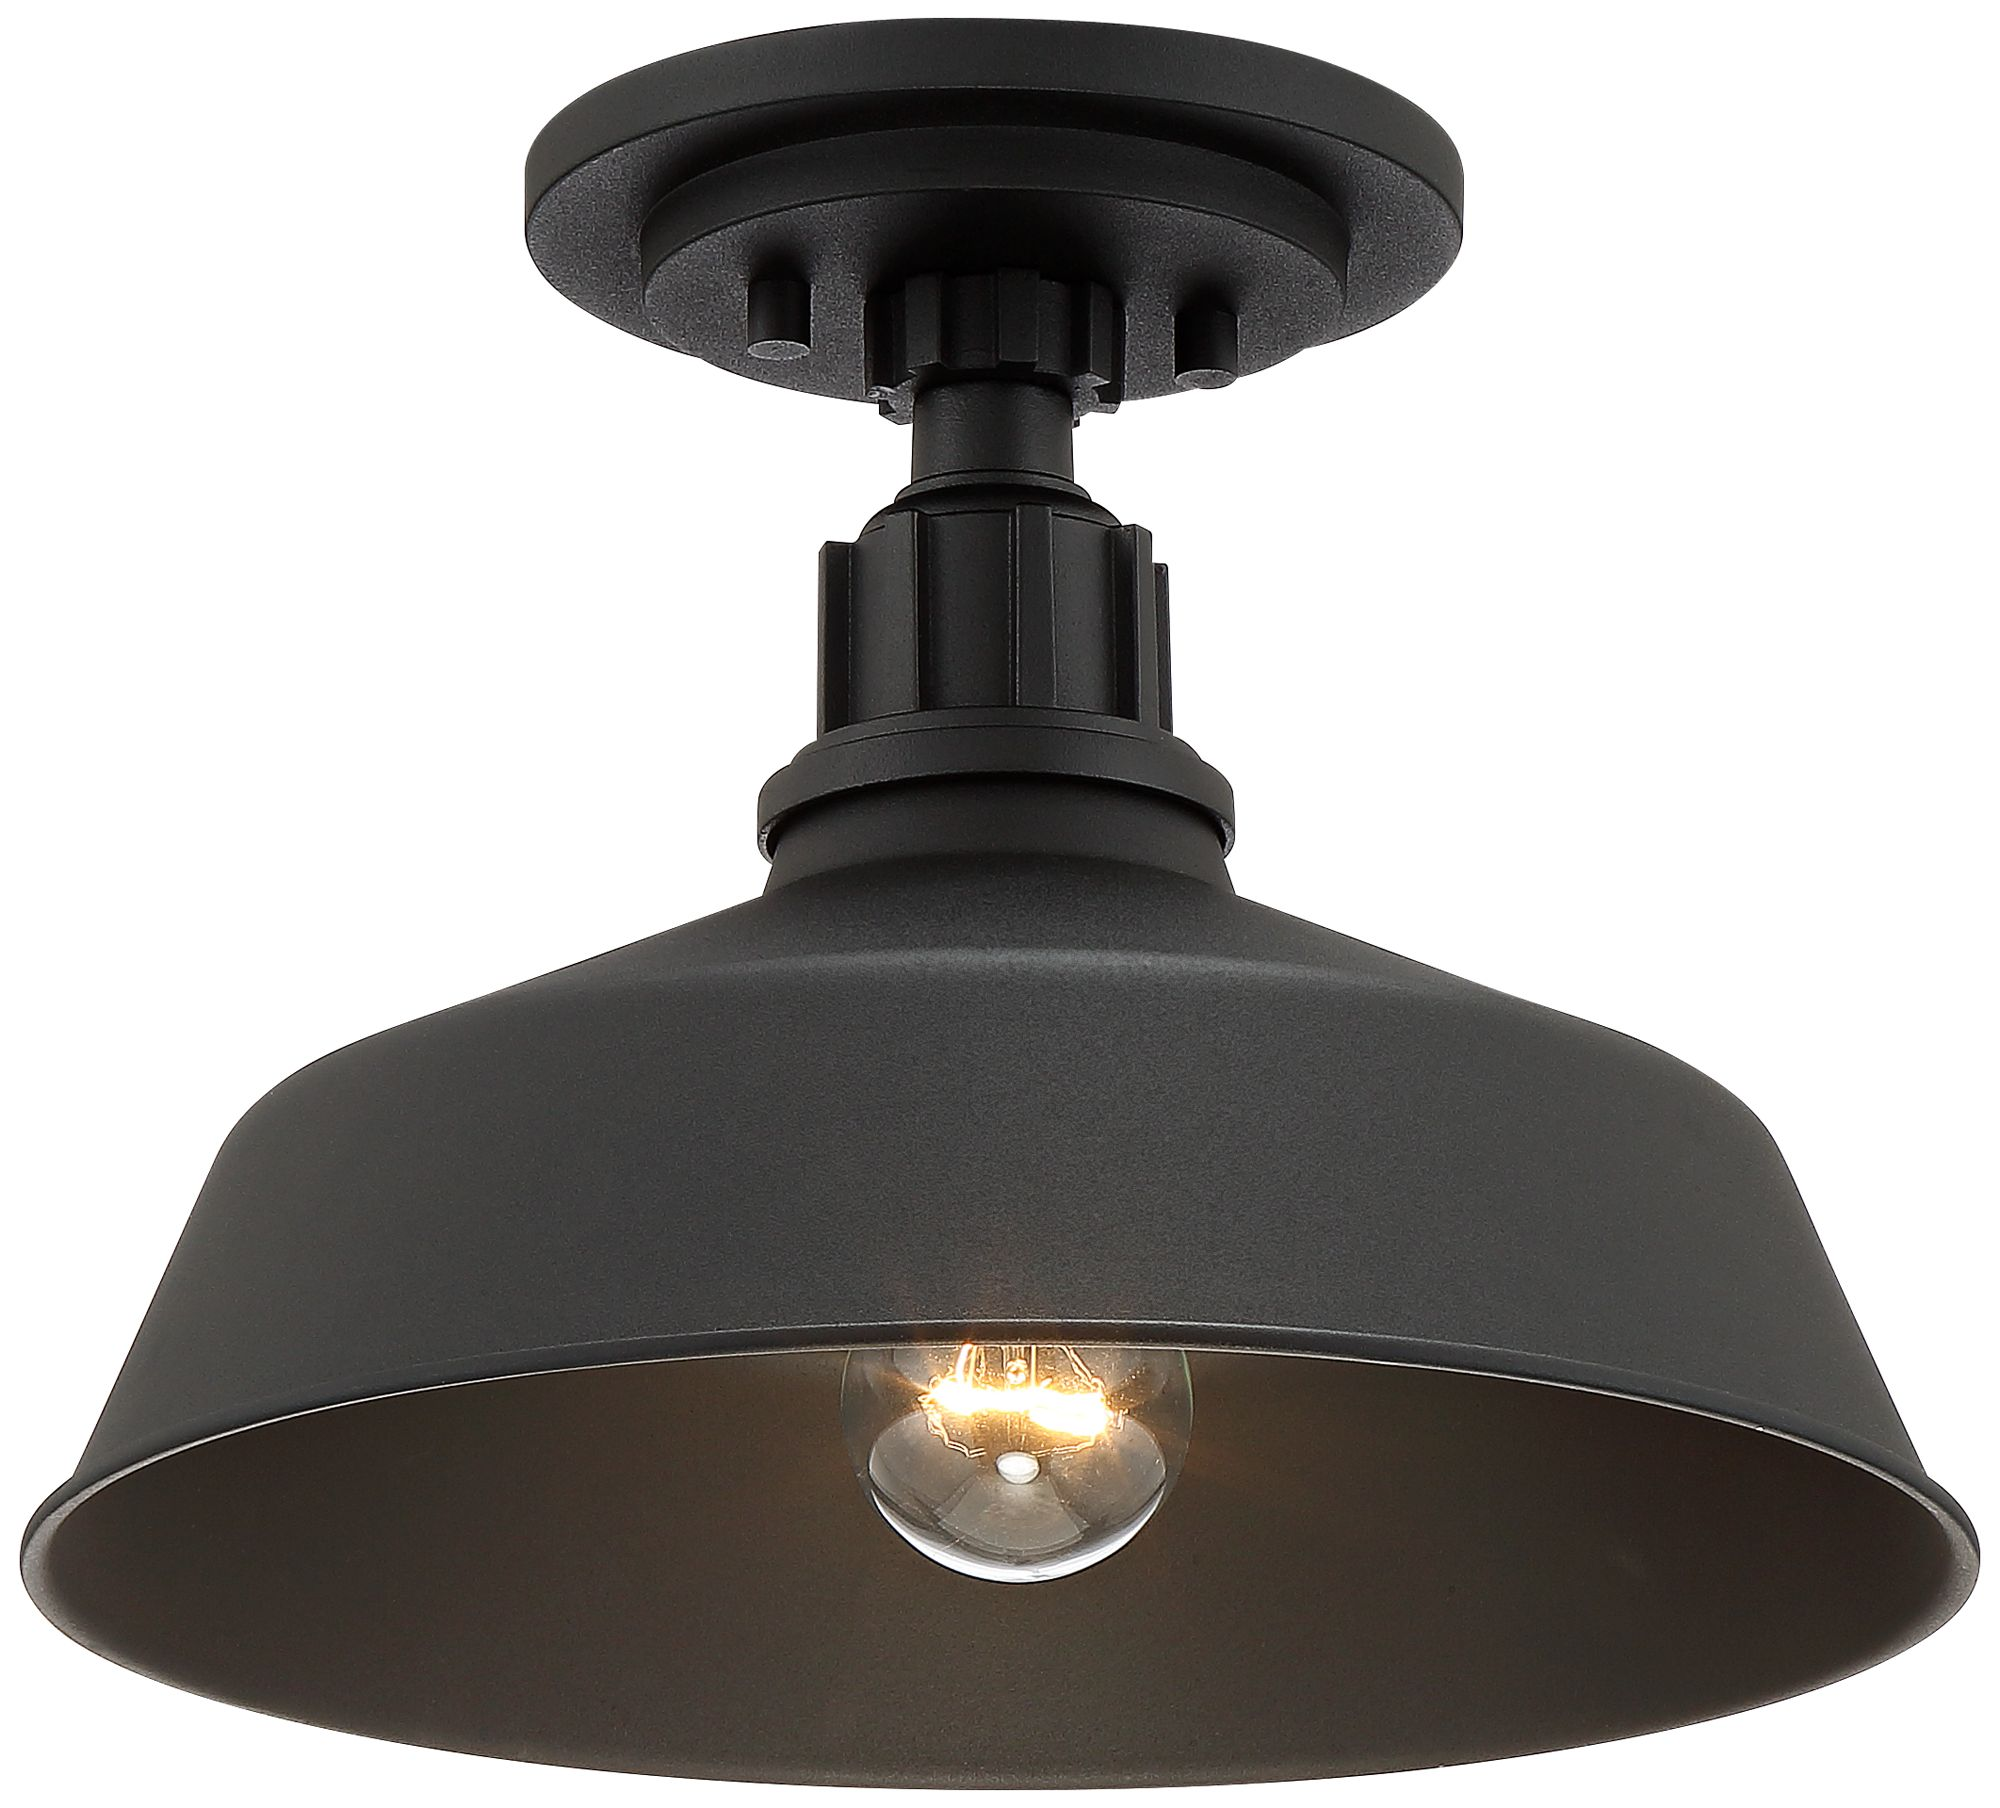 Black Outdoor Ceiling Light